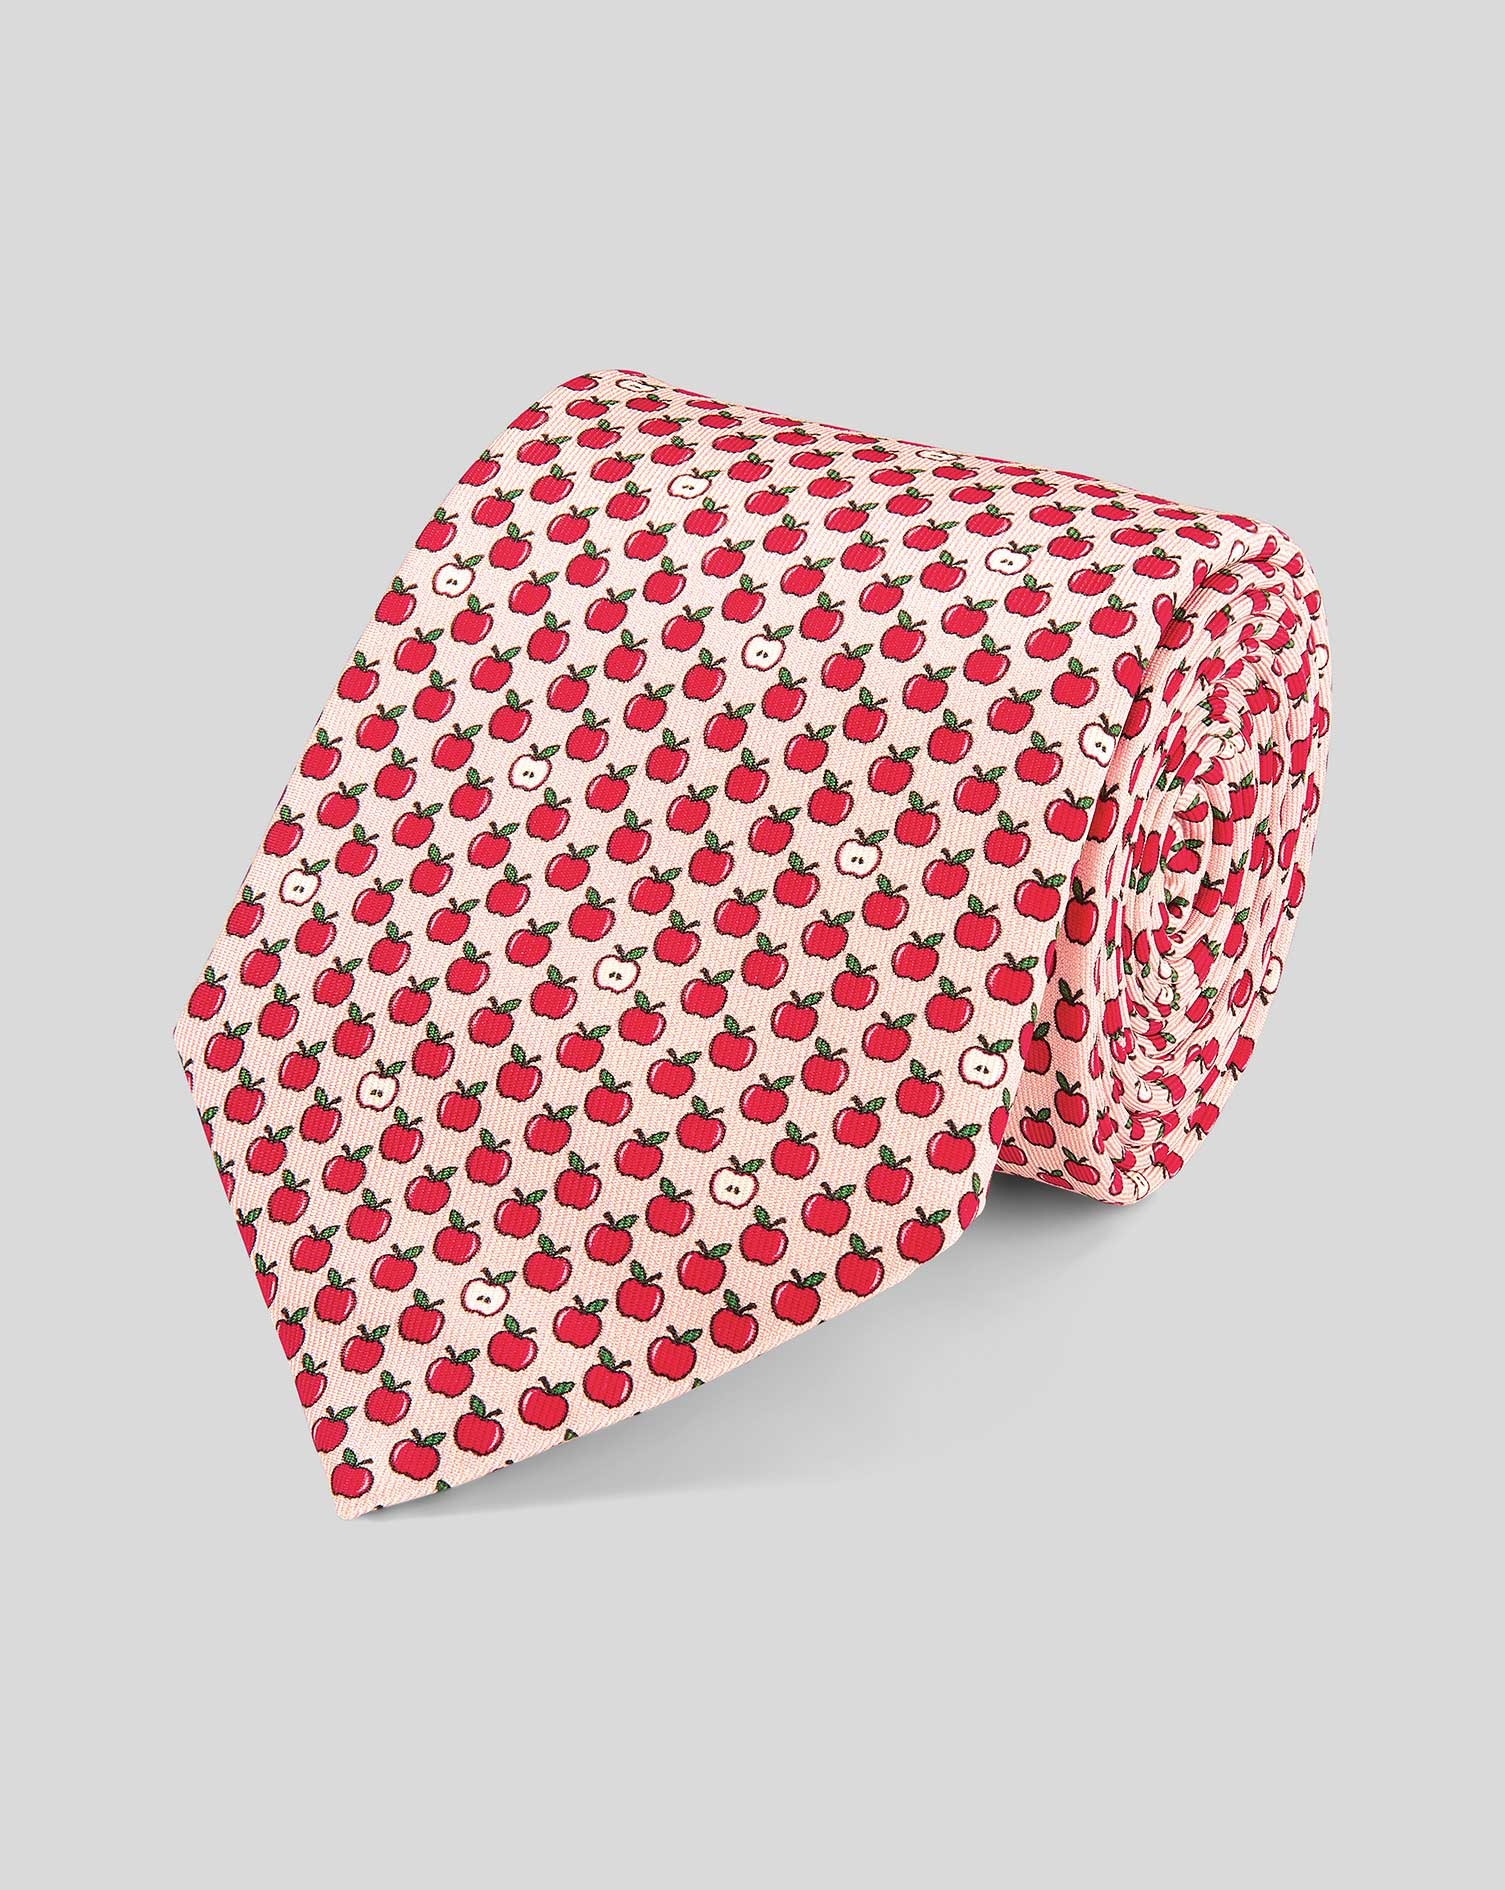 Image of Charles Tyrwhitt Apple Silk Print Classic Tie - Pink & Red by Charles Tyrwhitt